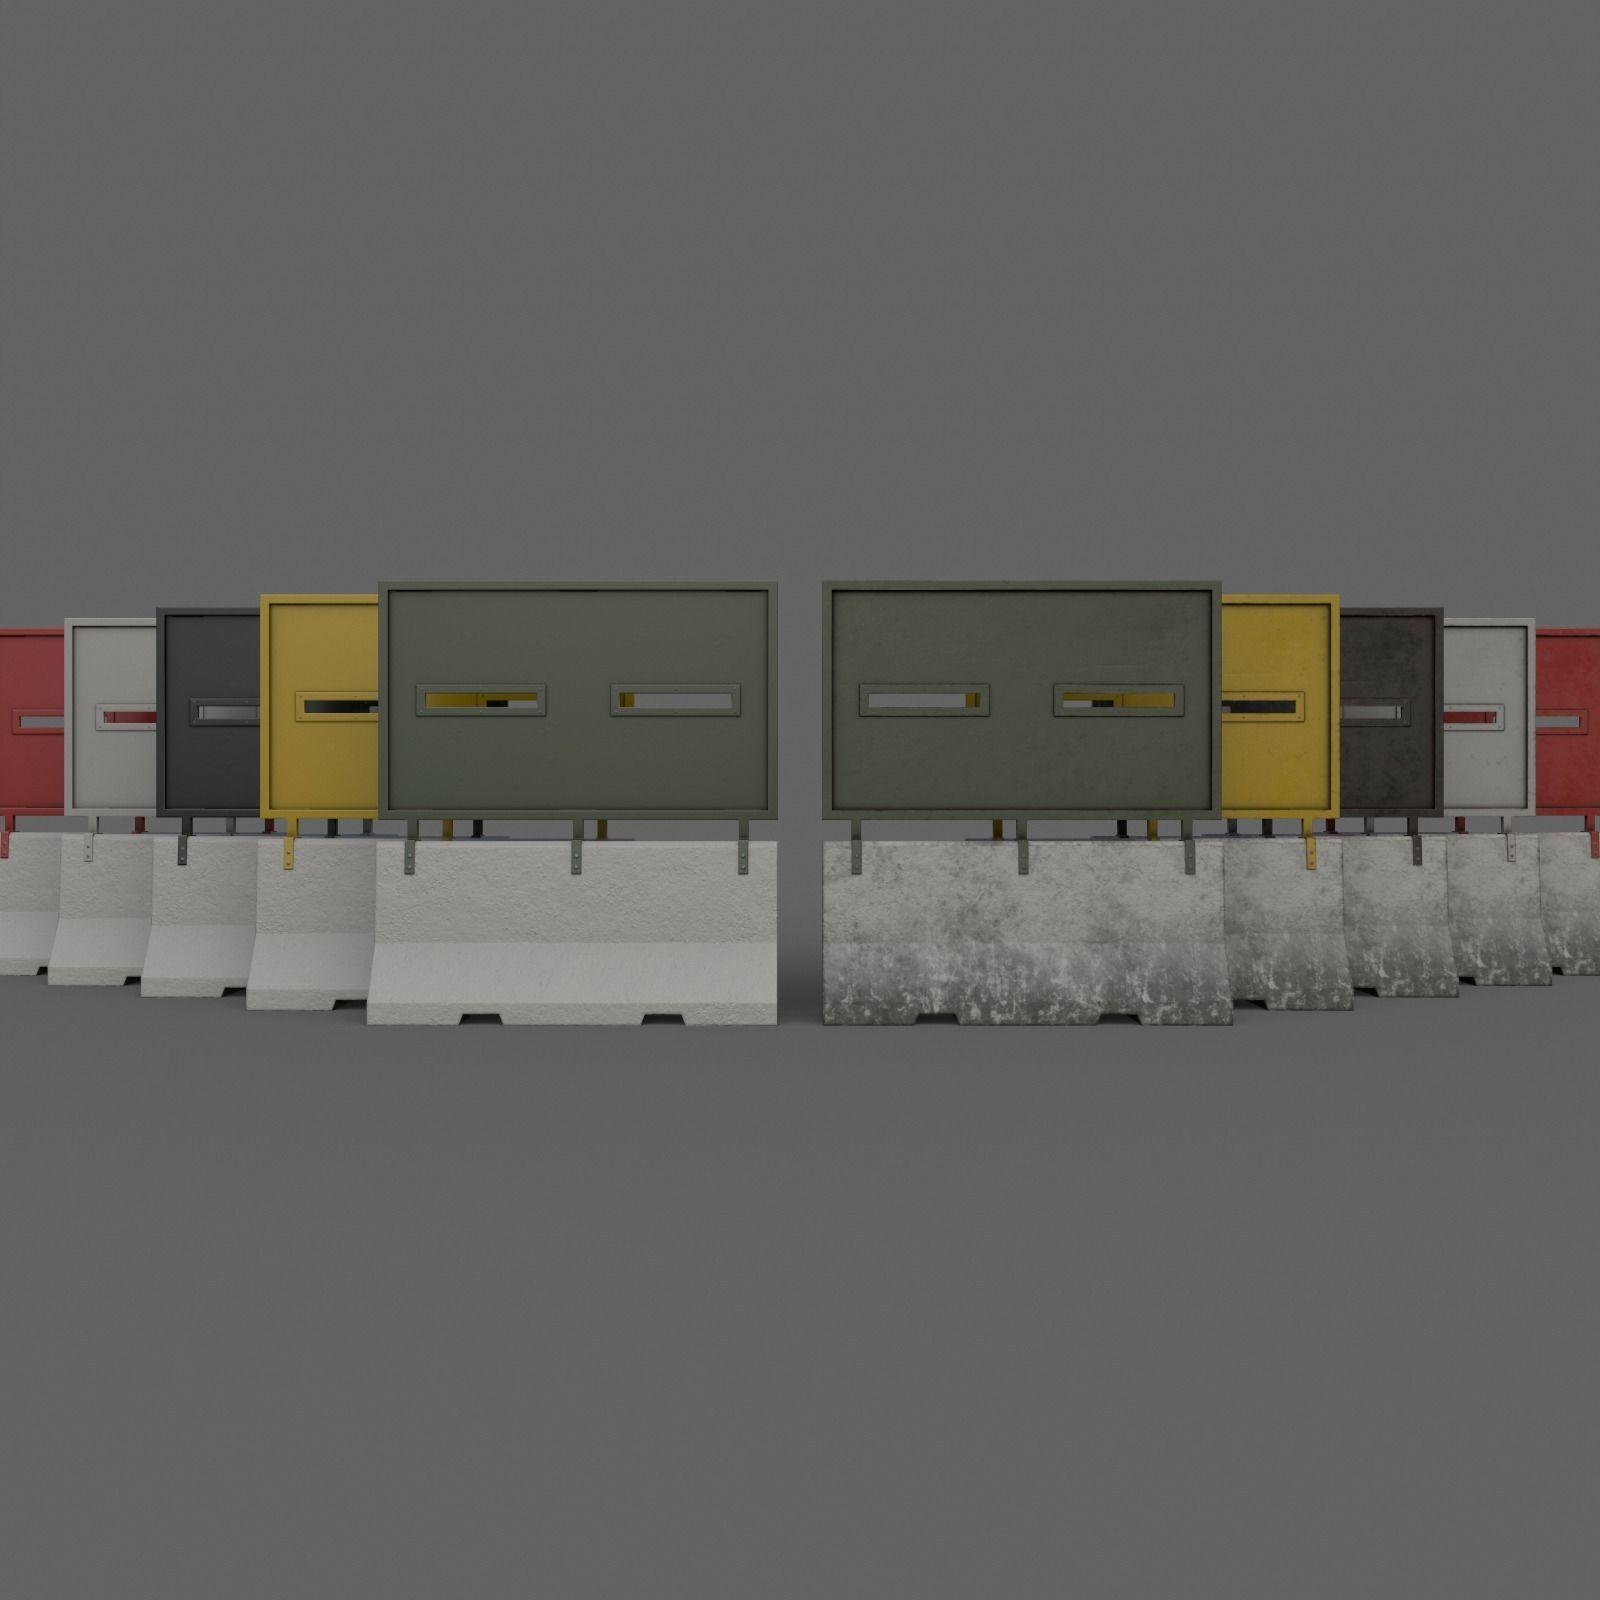 PBR Concrete Roadblock Barrier V5